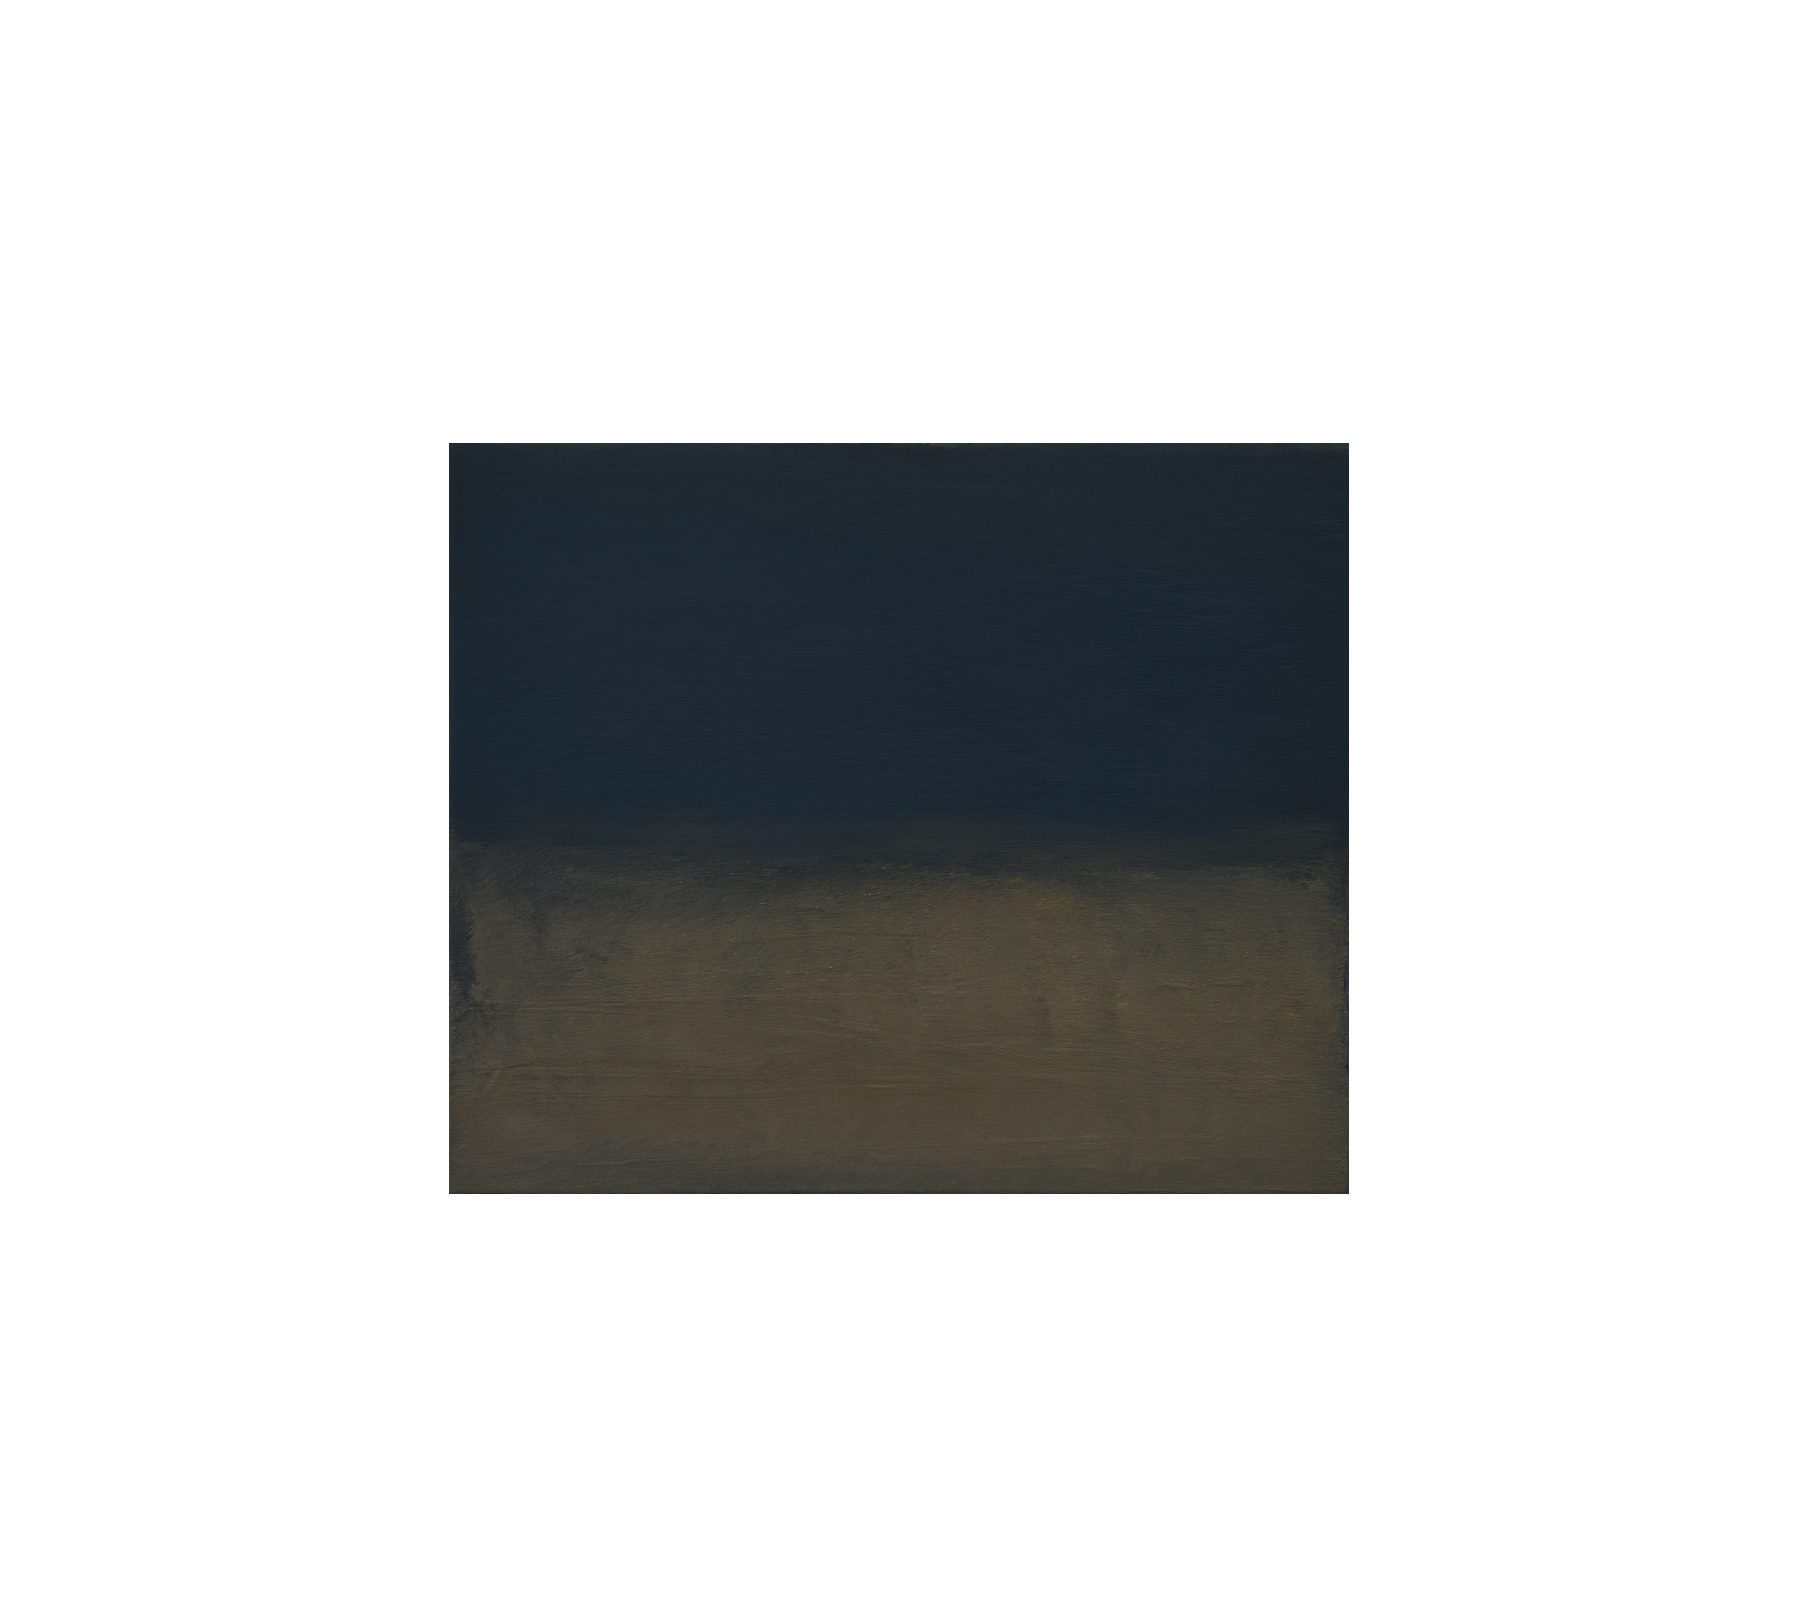 Untitled 2019 50x60cm